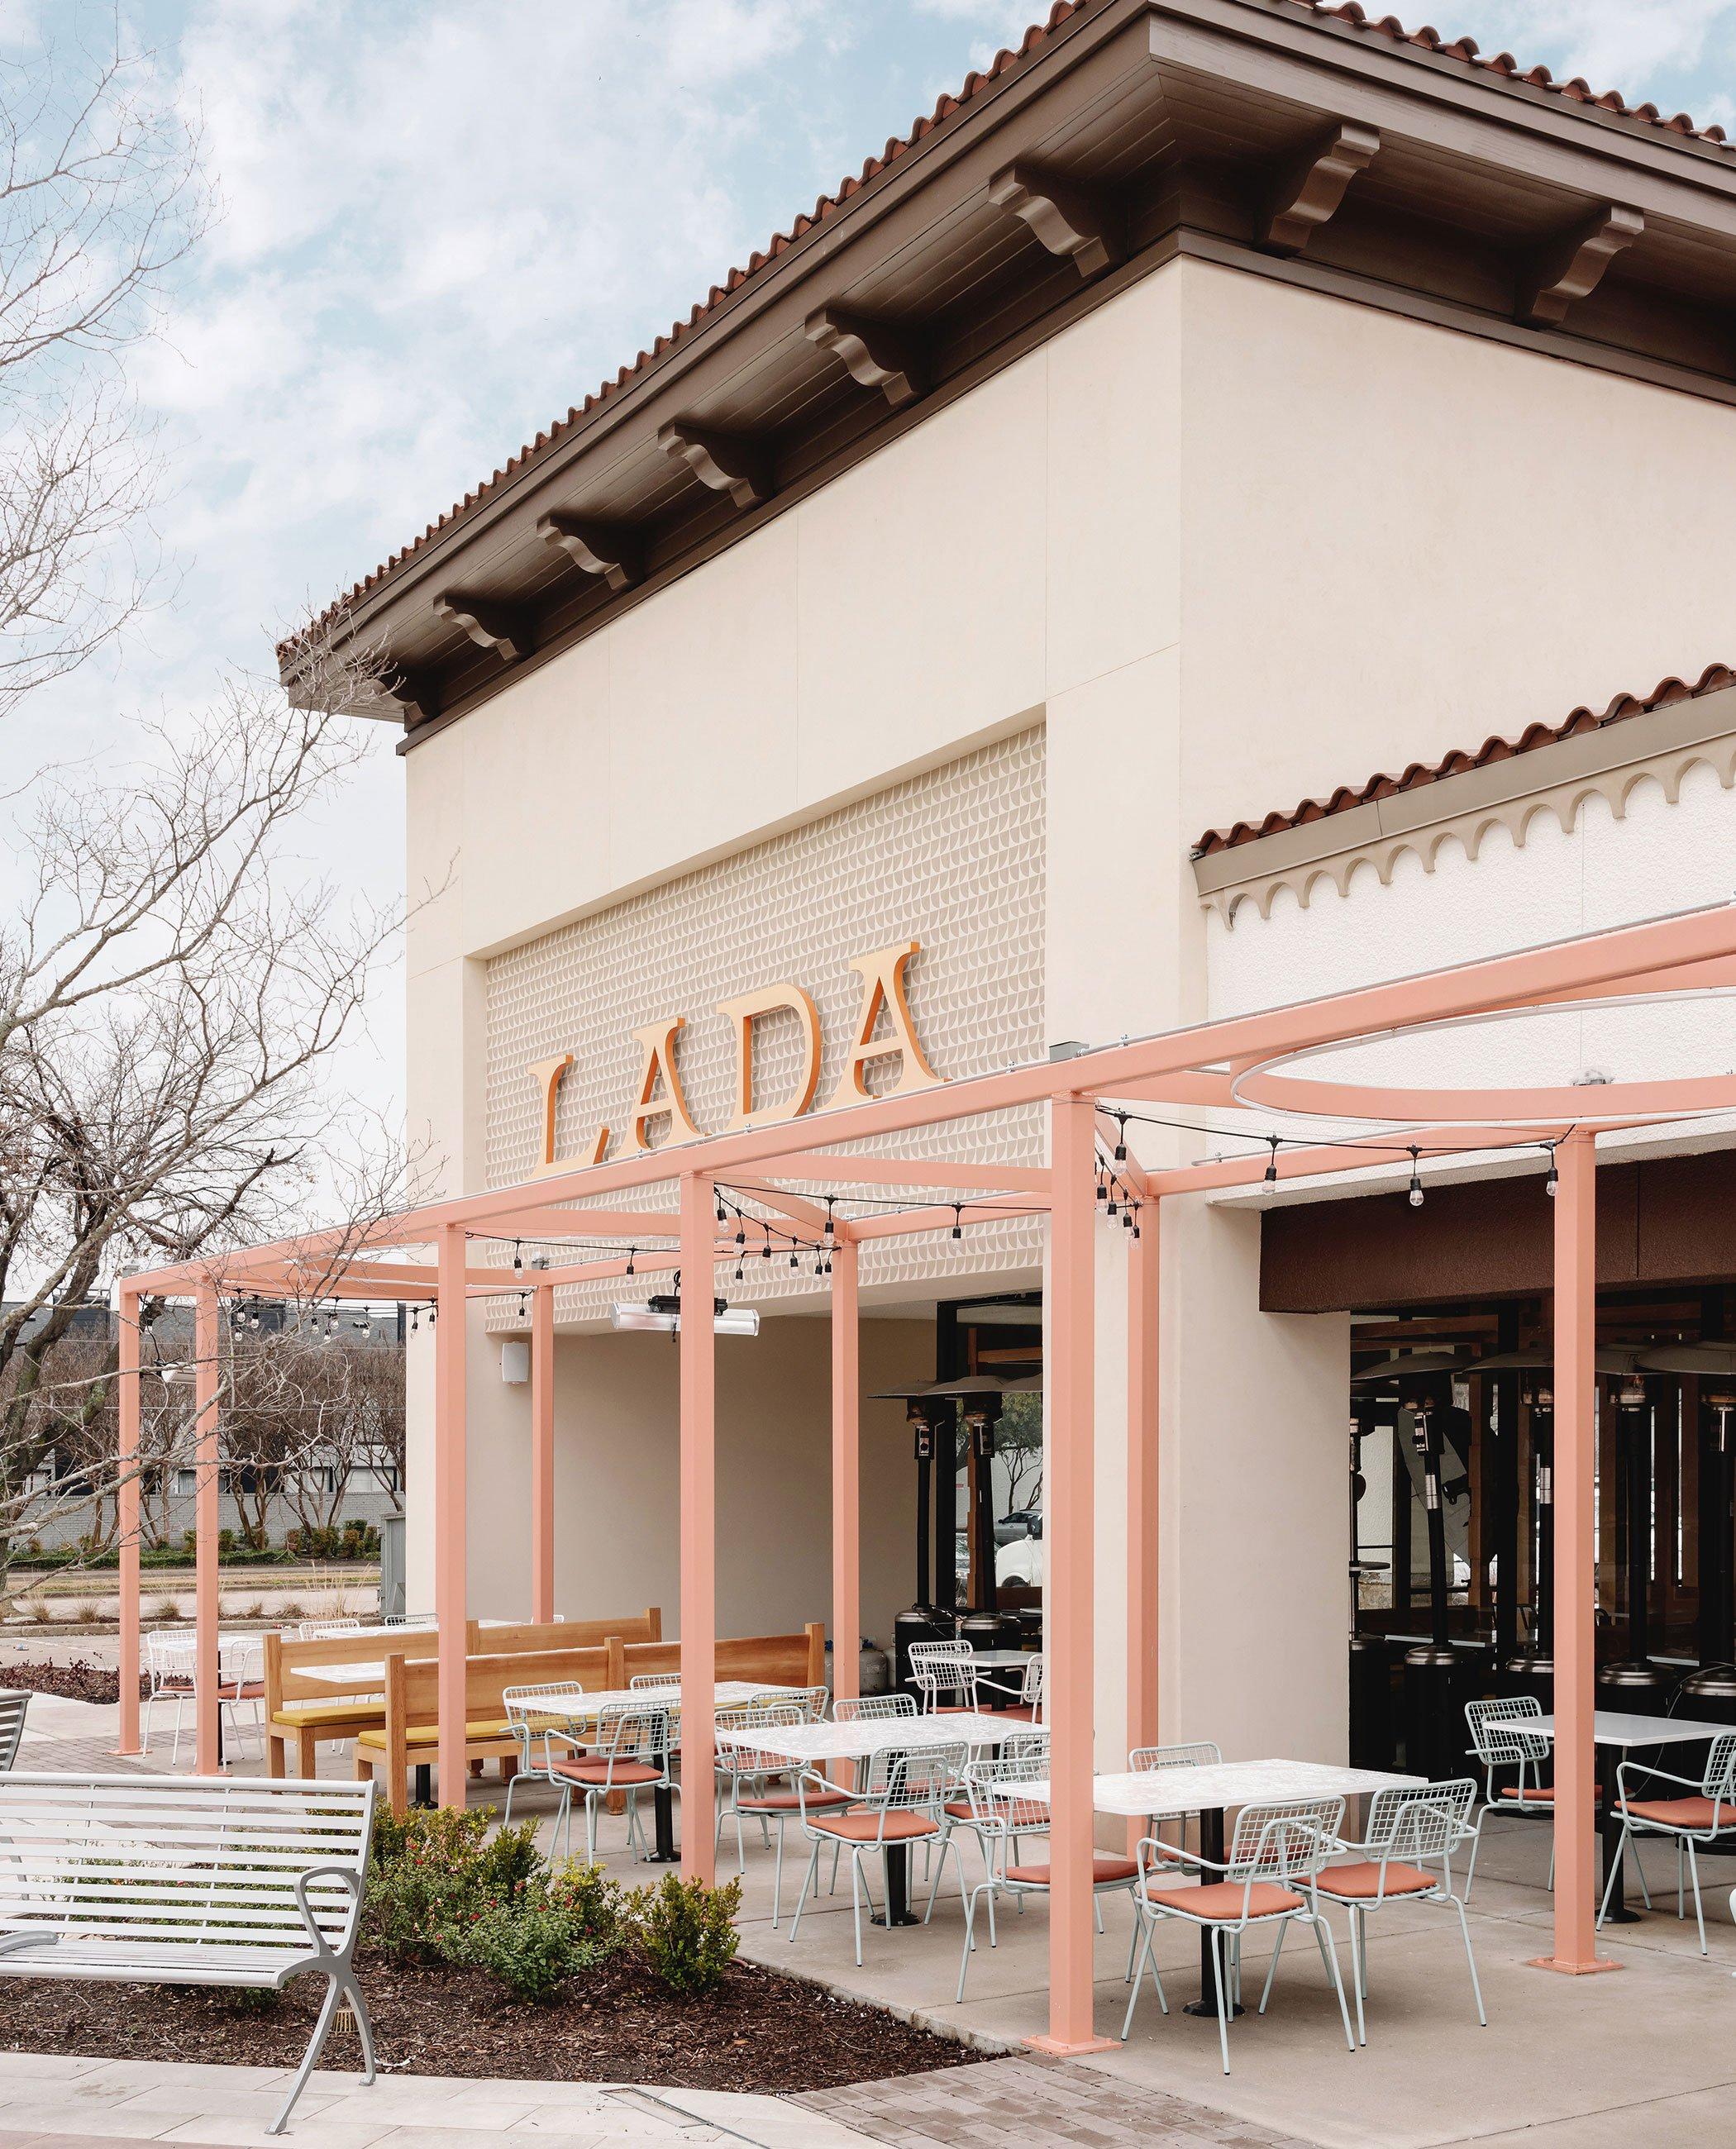 Lada_Opla_Outdoor_Furniture_Patio_Restaurant